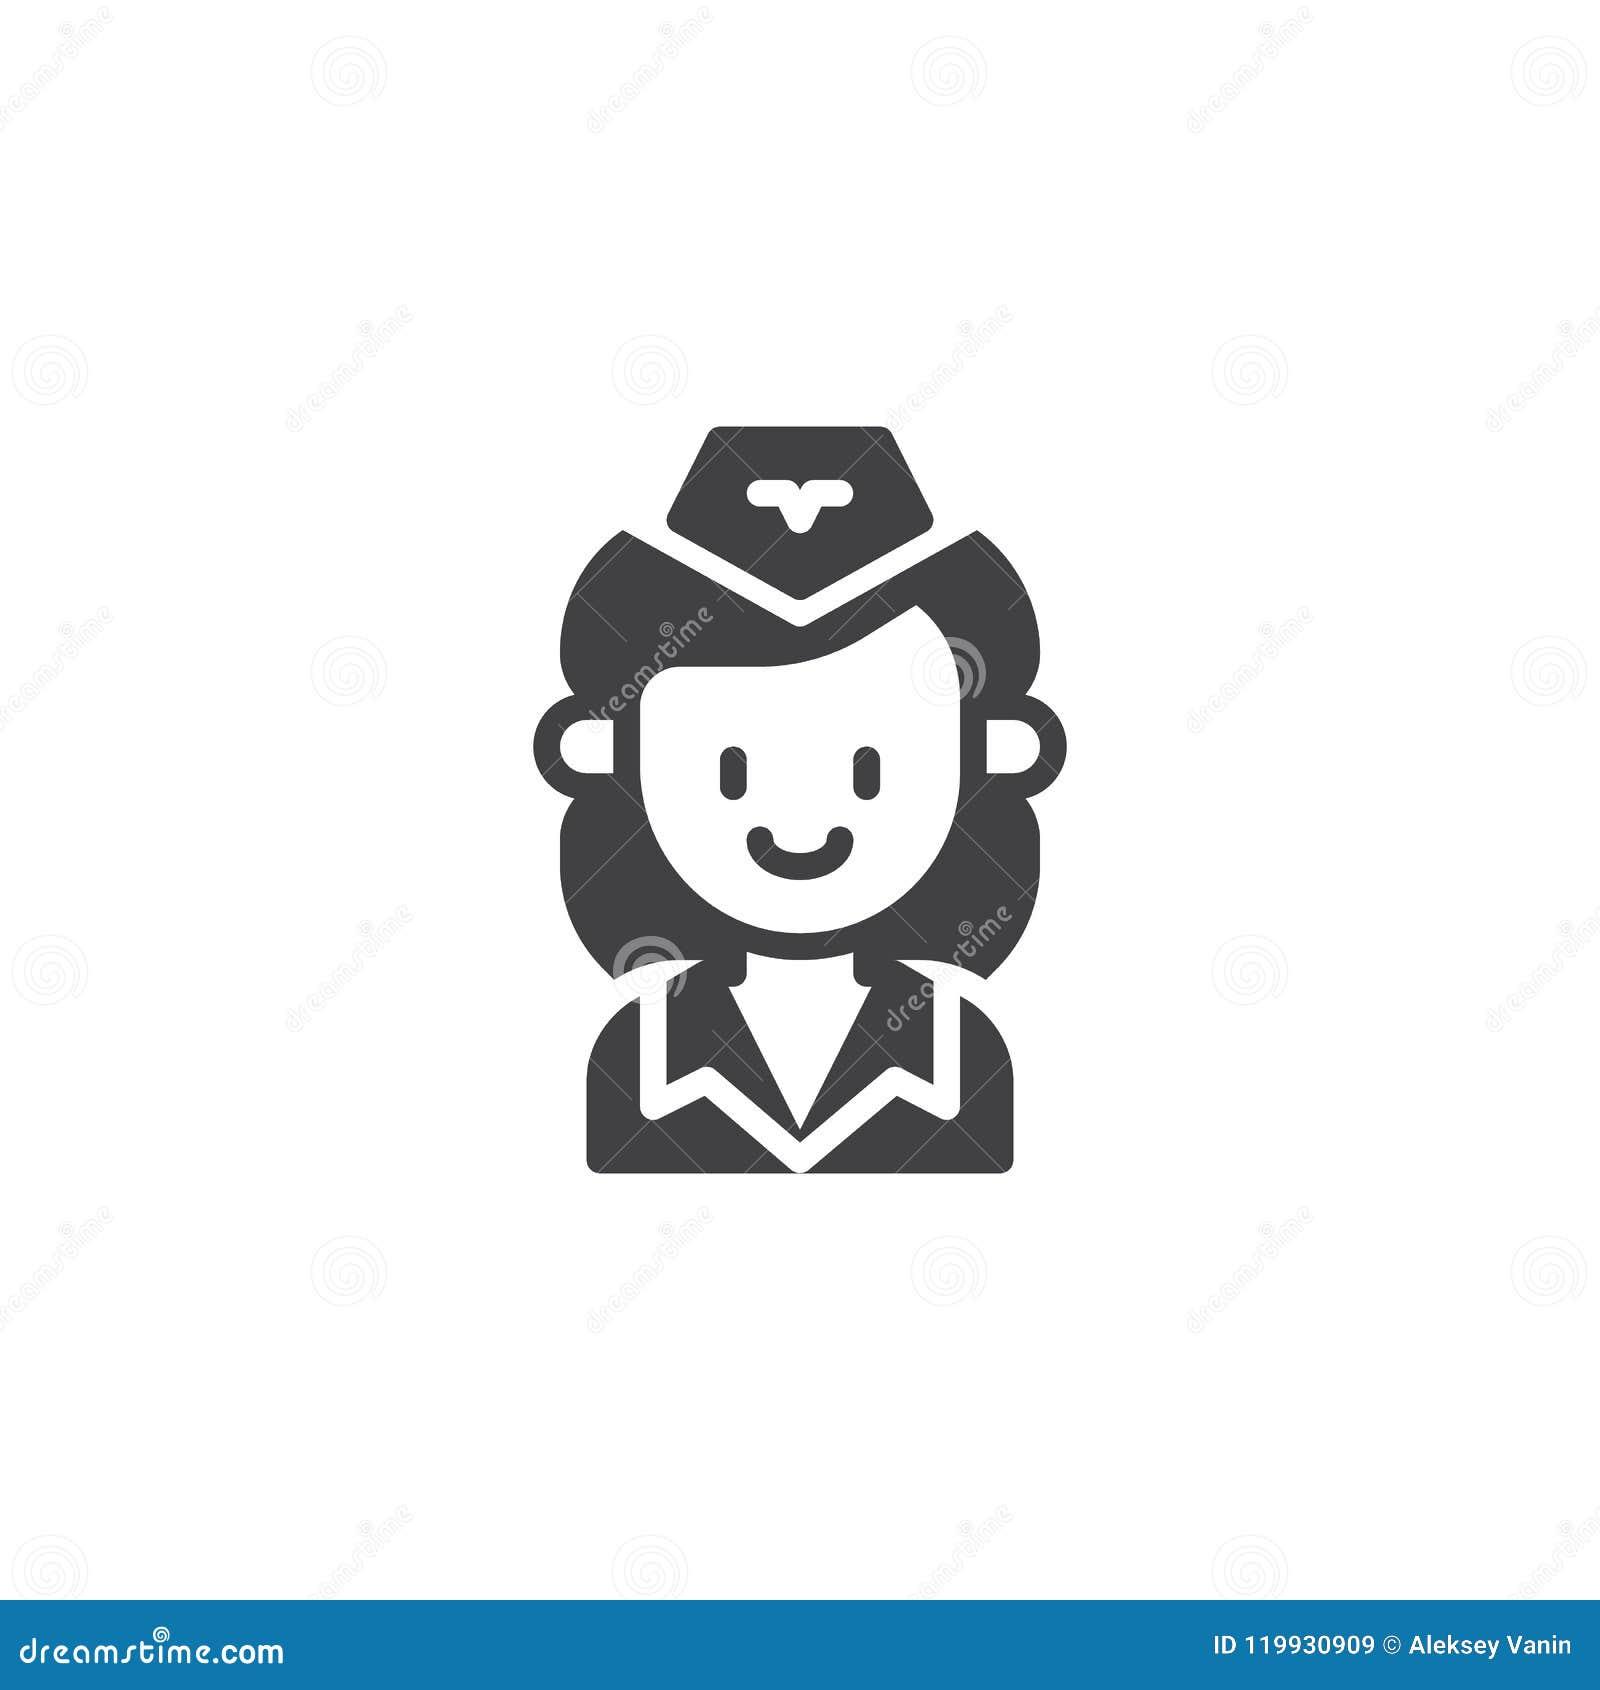 Stewardess Vector Icon Stock Vector Illustration Of Icon 119930909